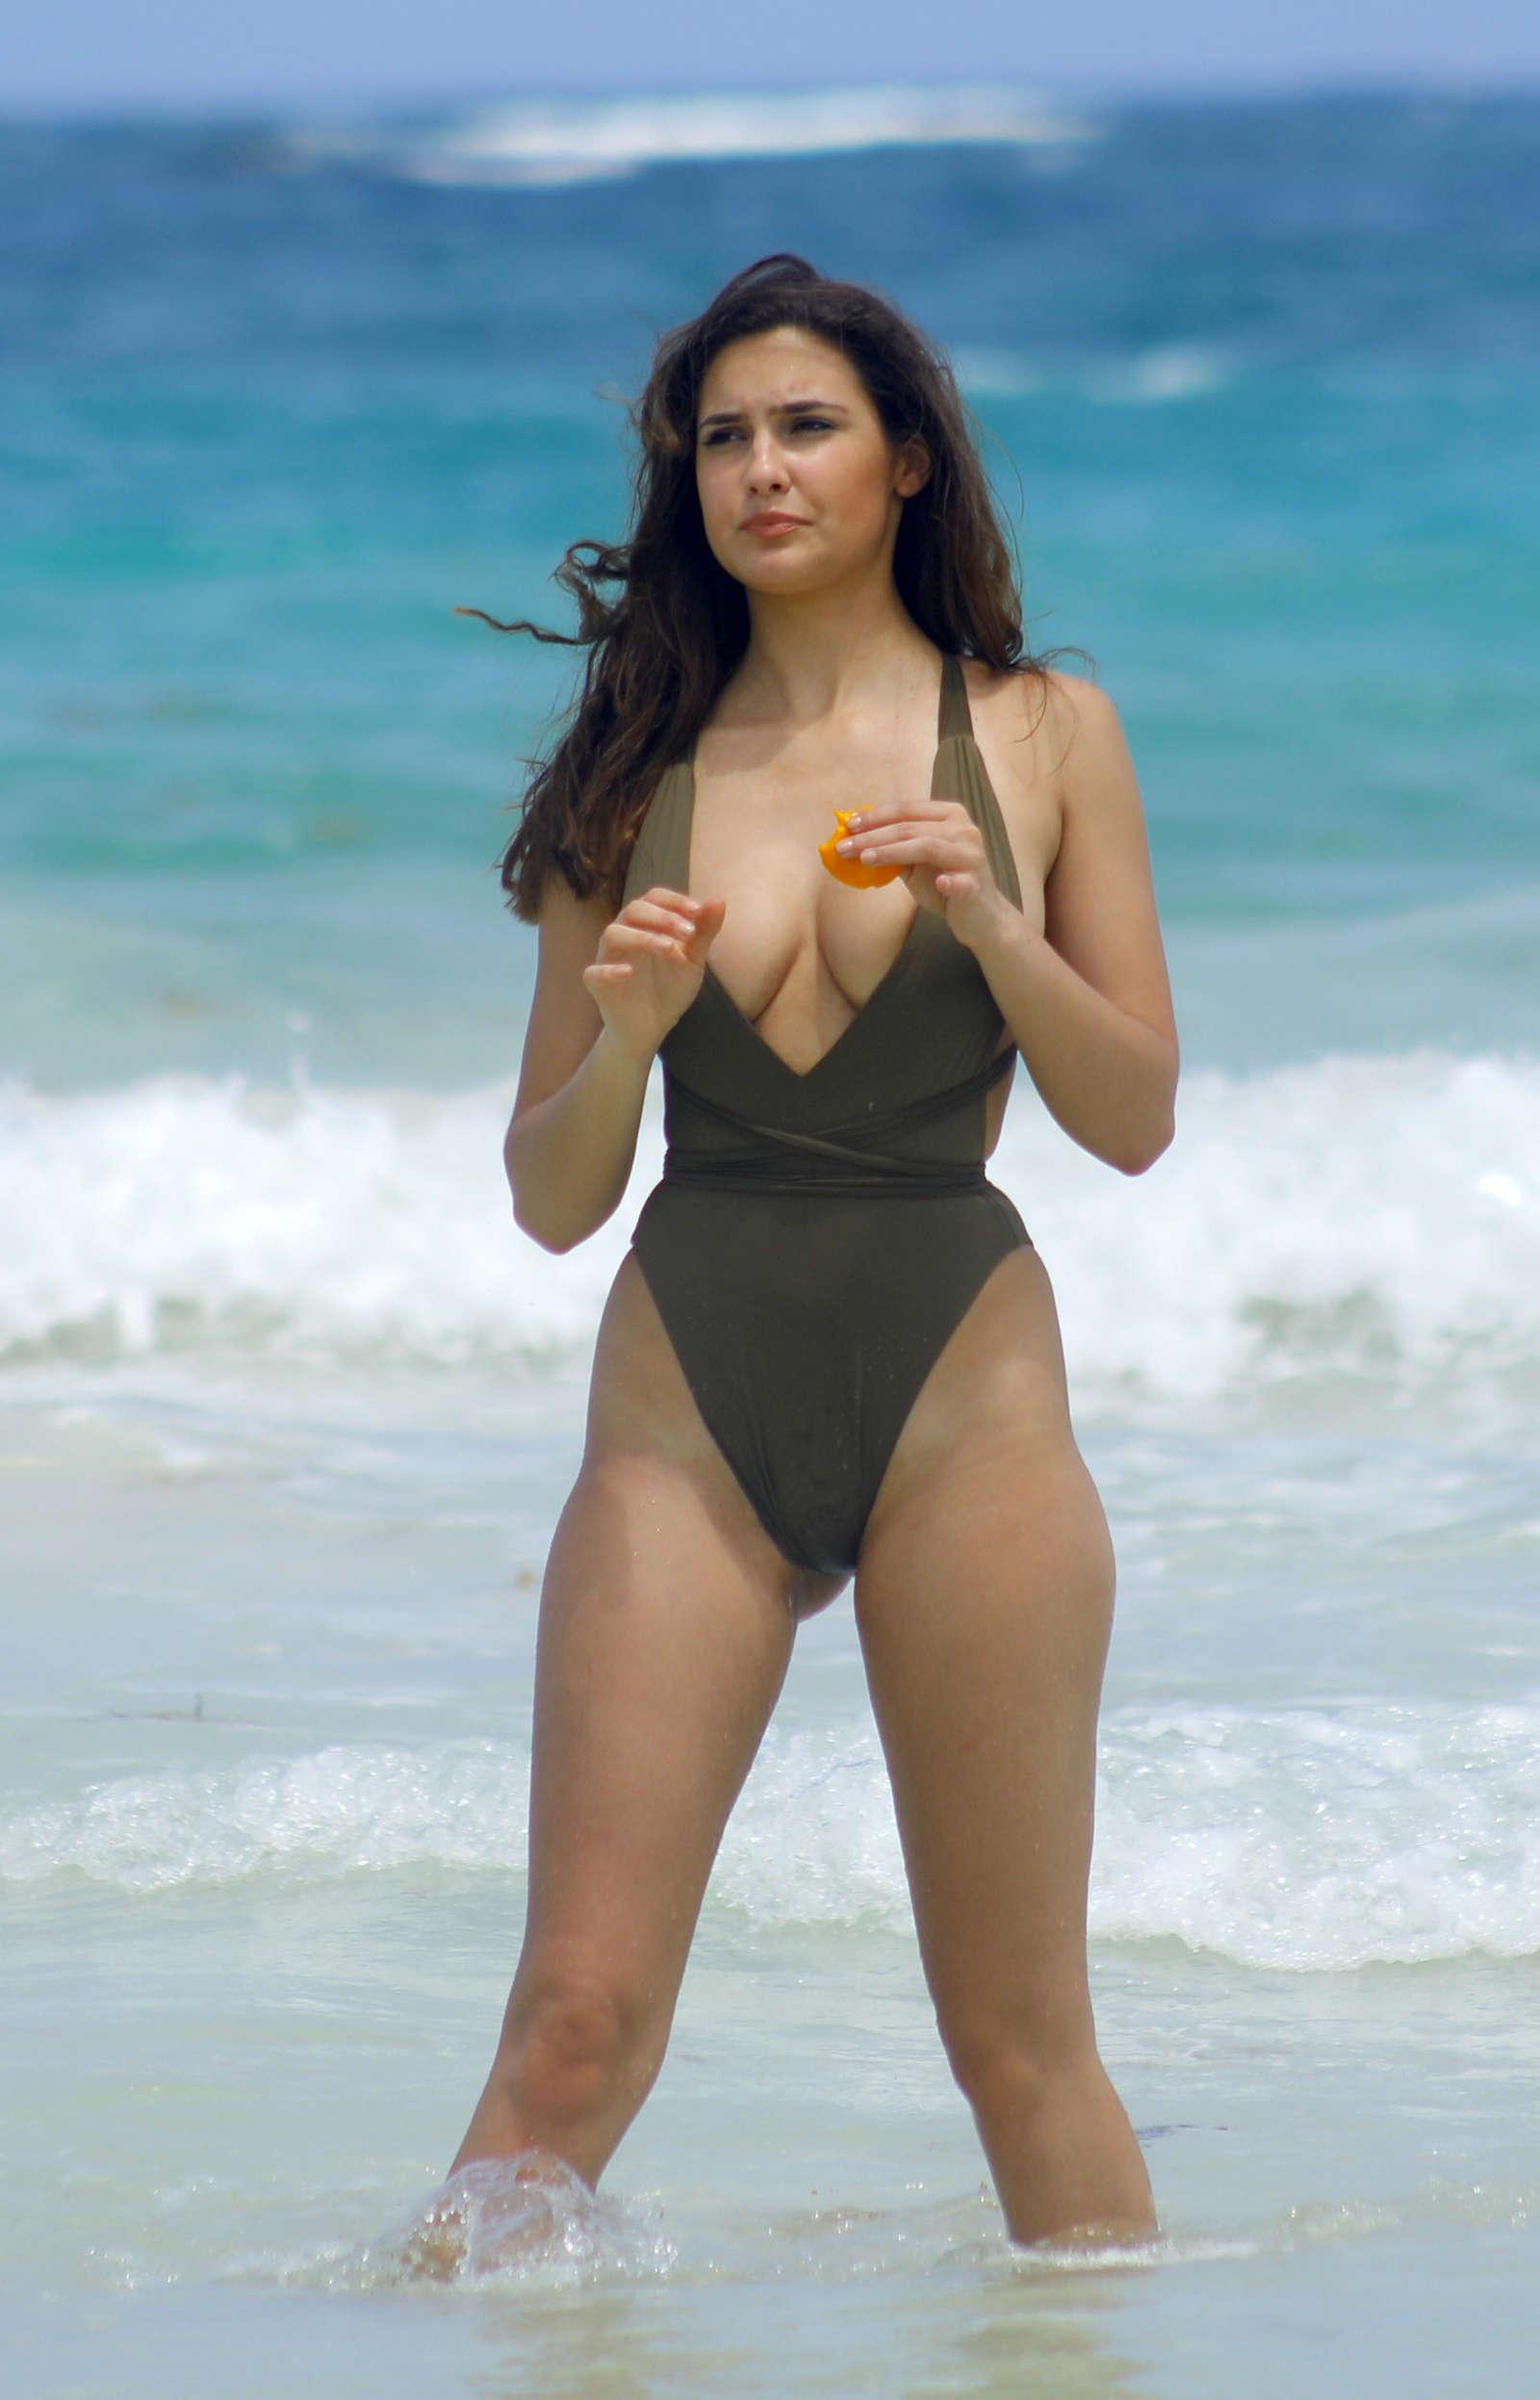 mandy moore bikini